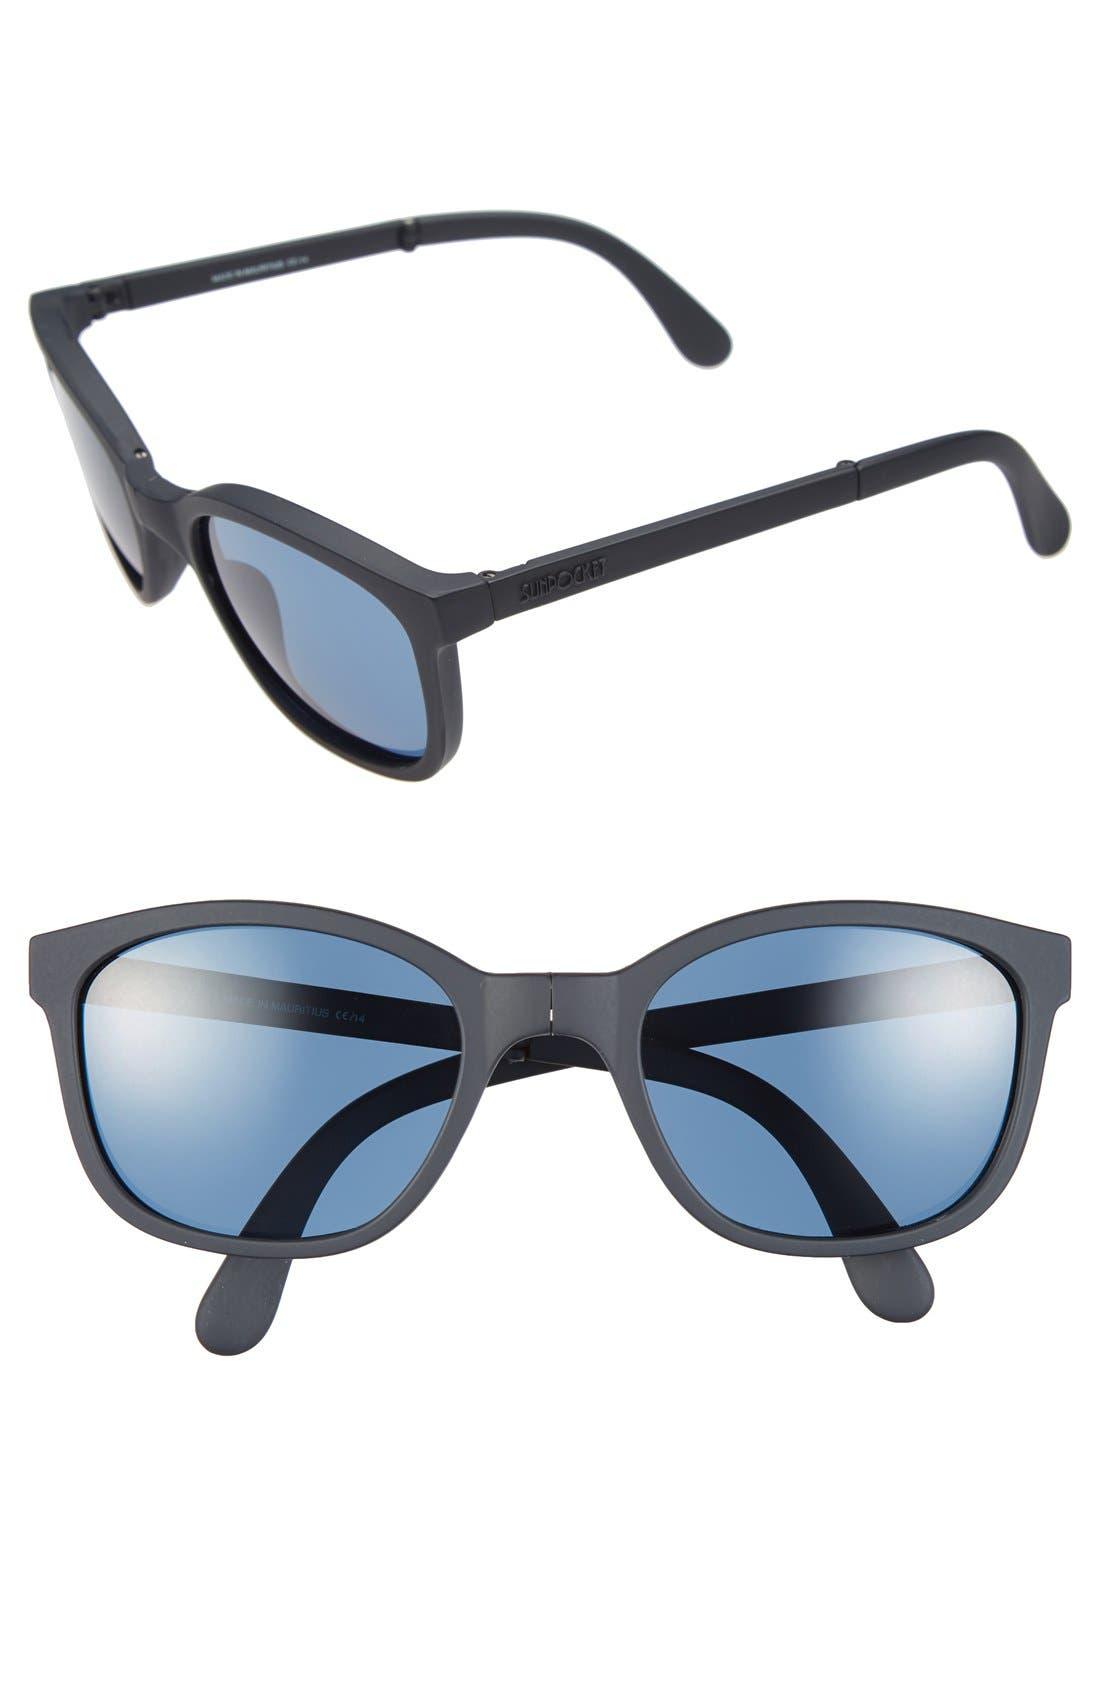 Main Image - Sunpocket 'Tonga' 53mm Folding Sunglasses